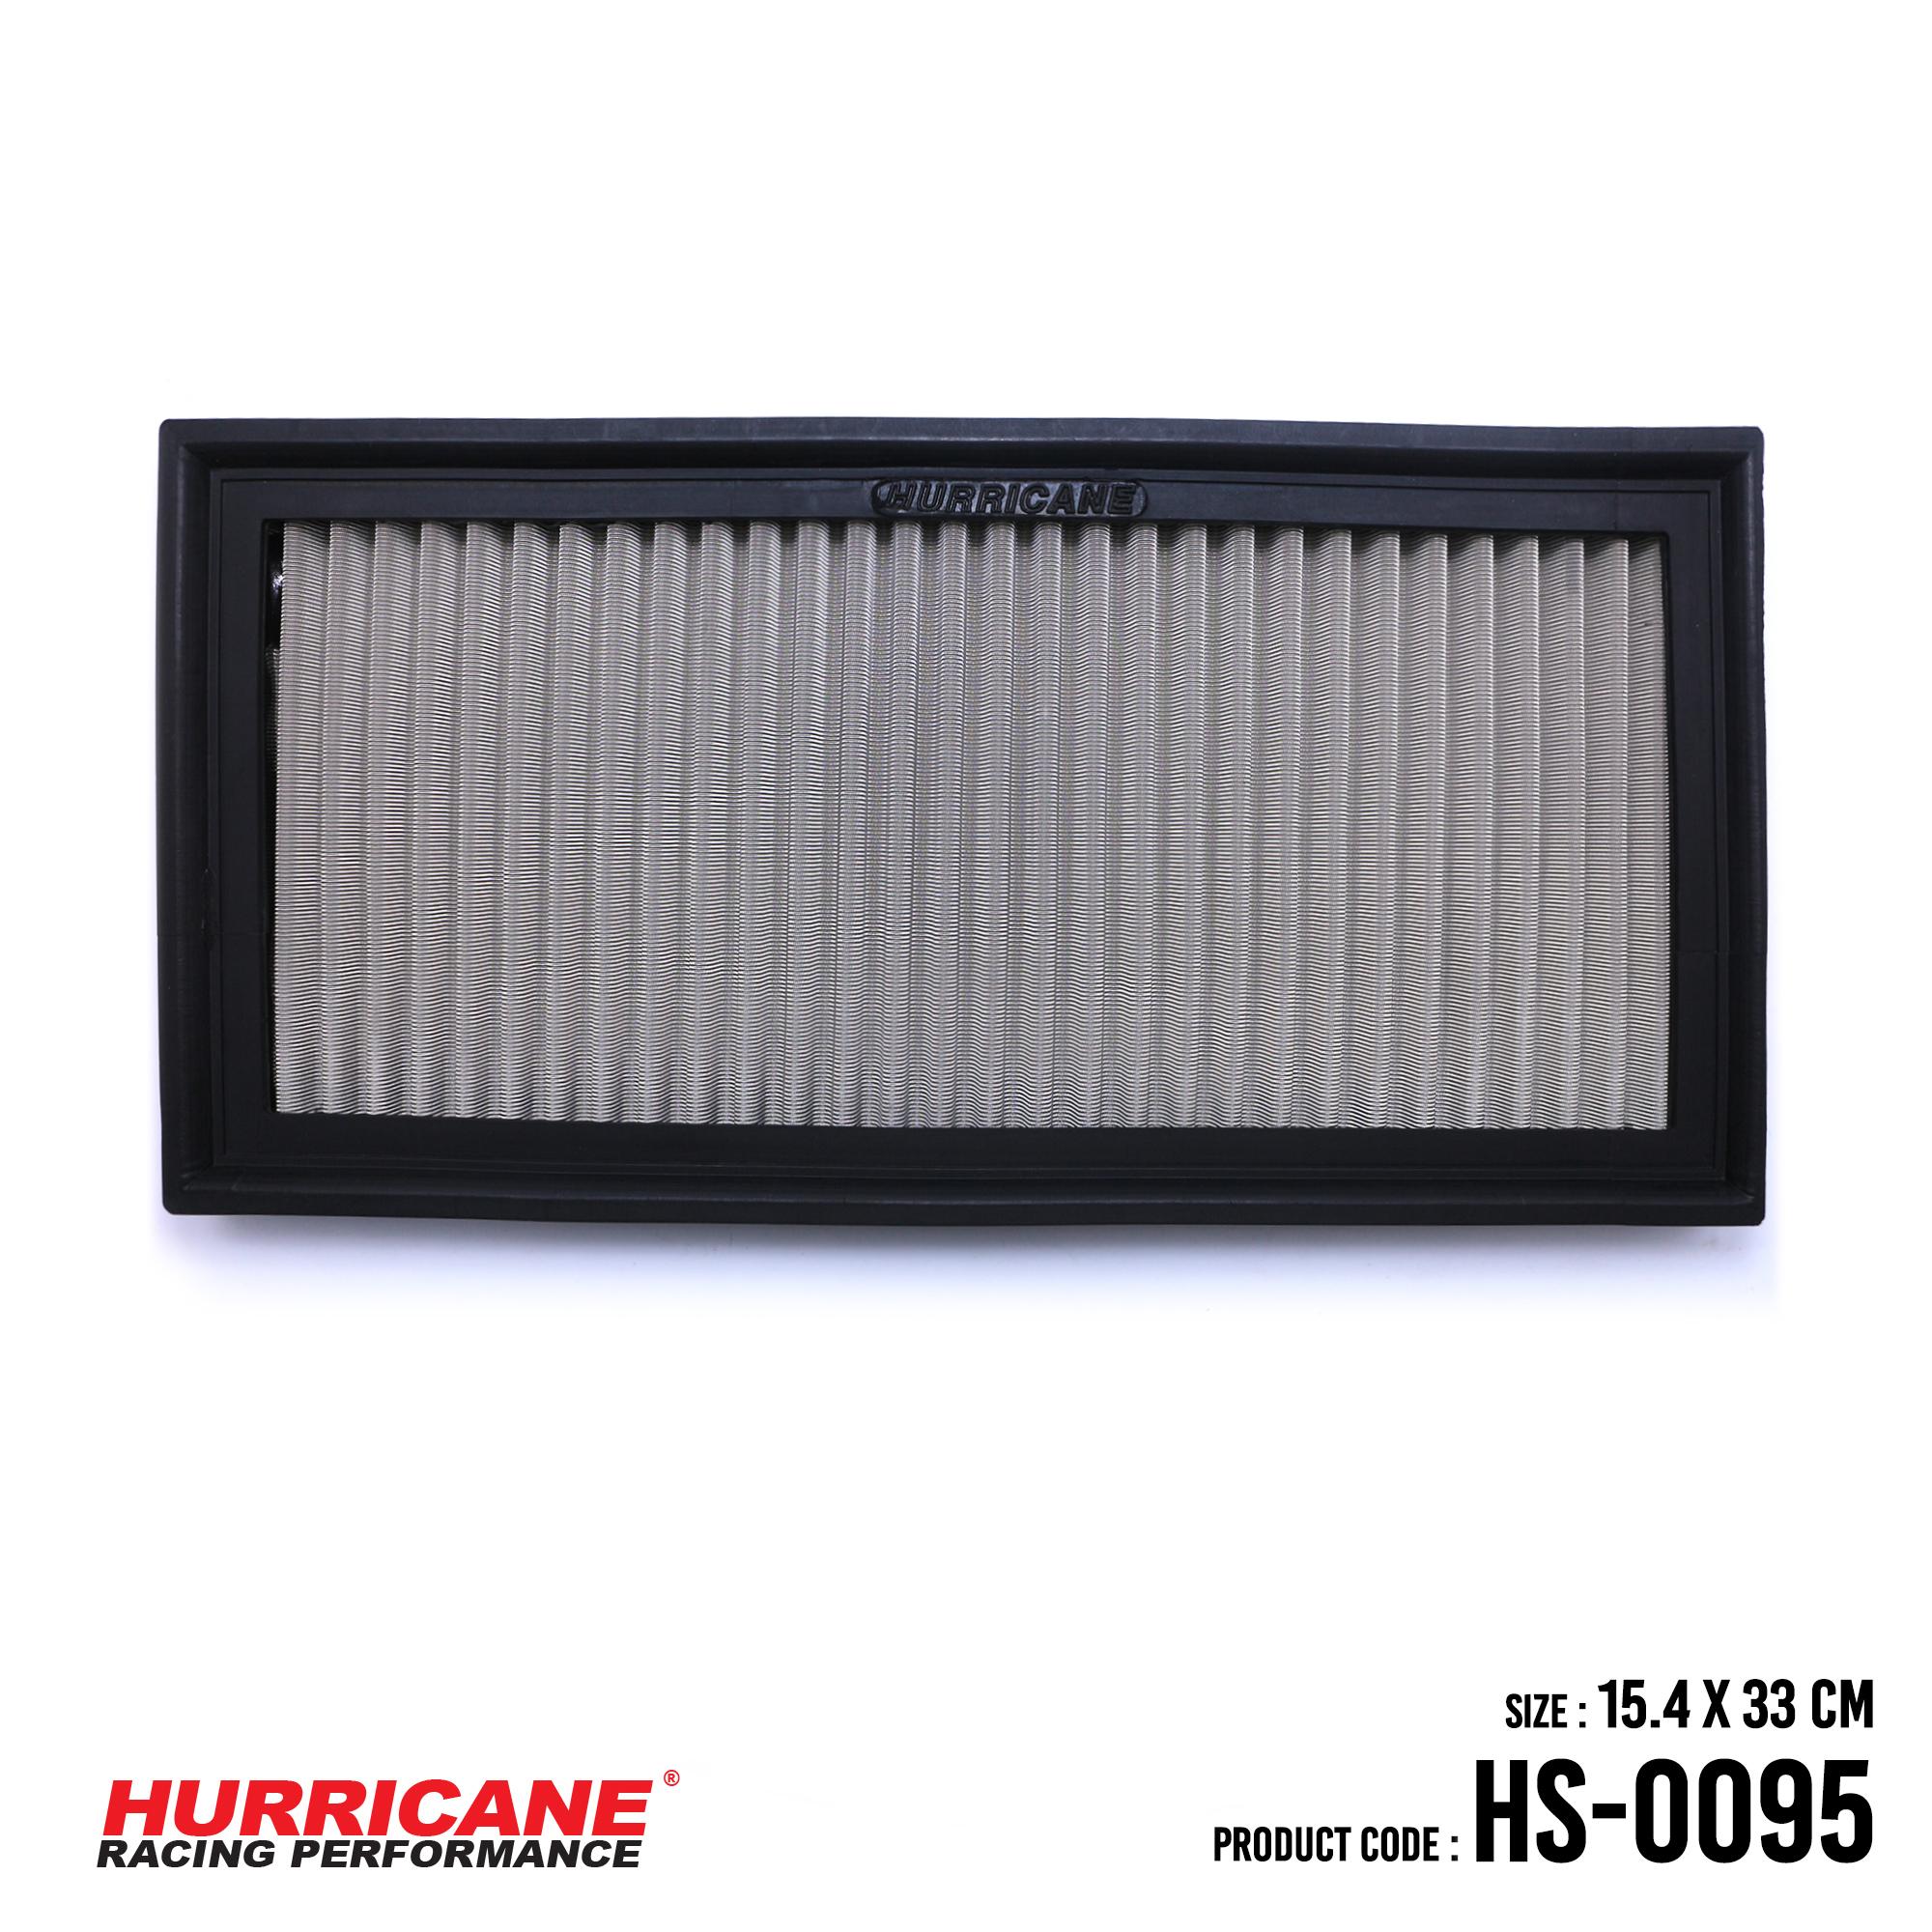 HURRICANE STAINLESS STEEL AIR FILTER FOR HS-0095 MercedesBenz